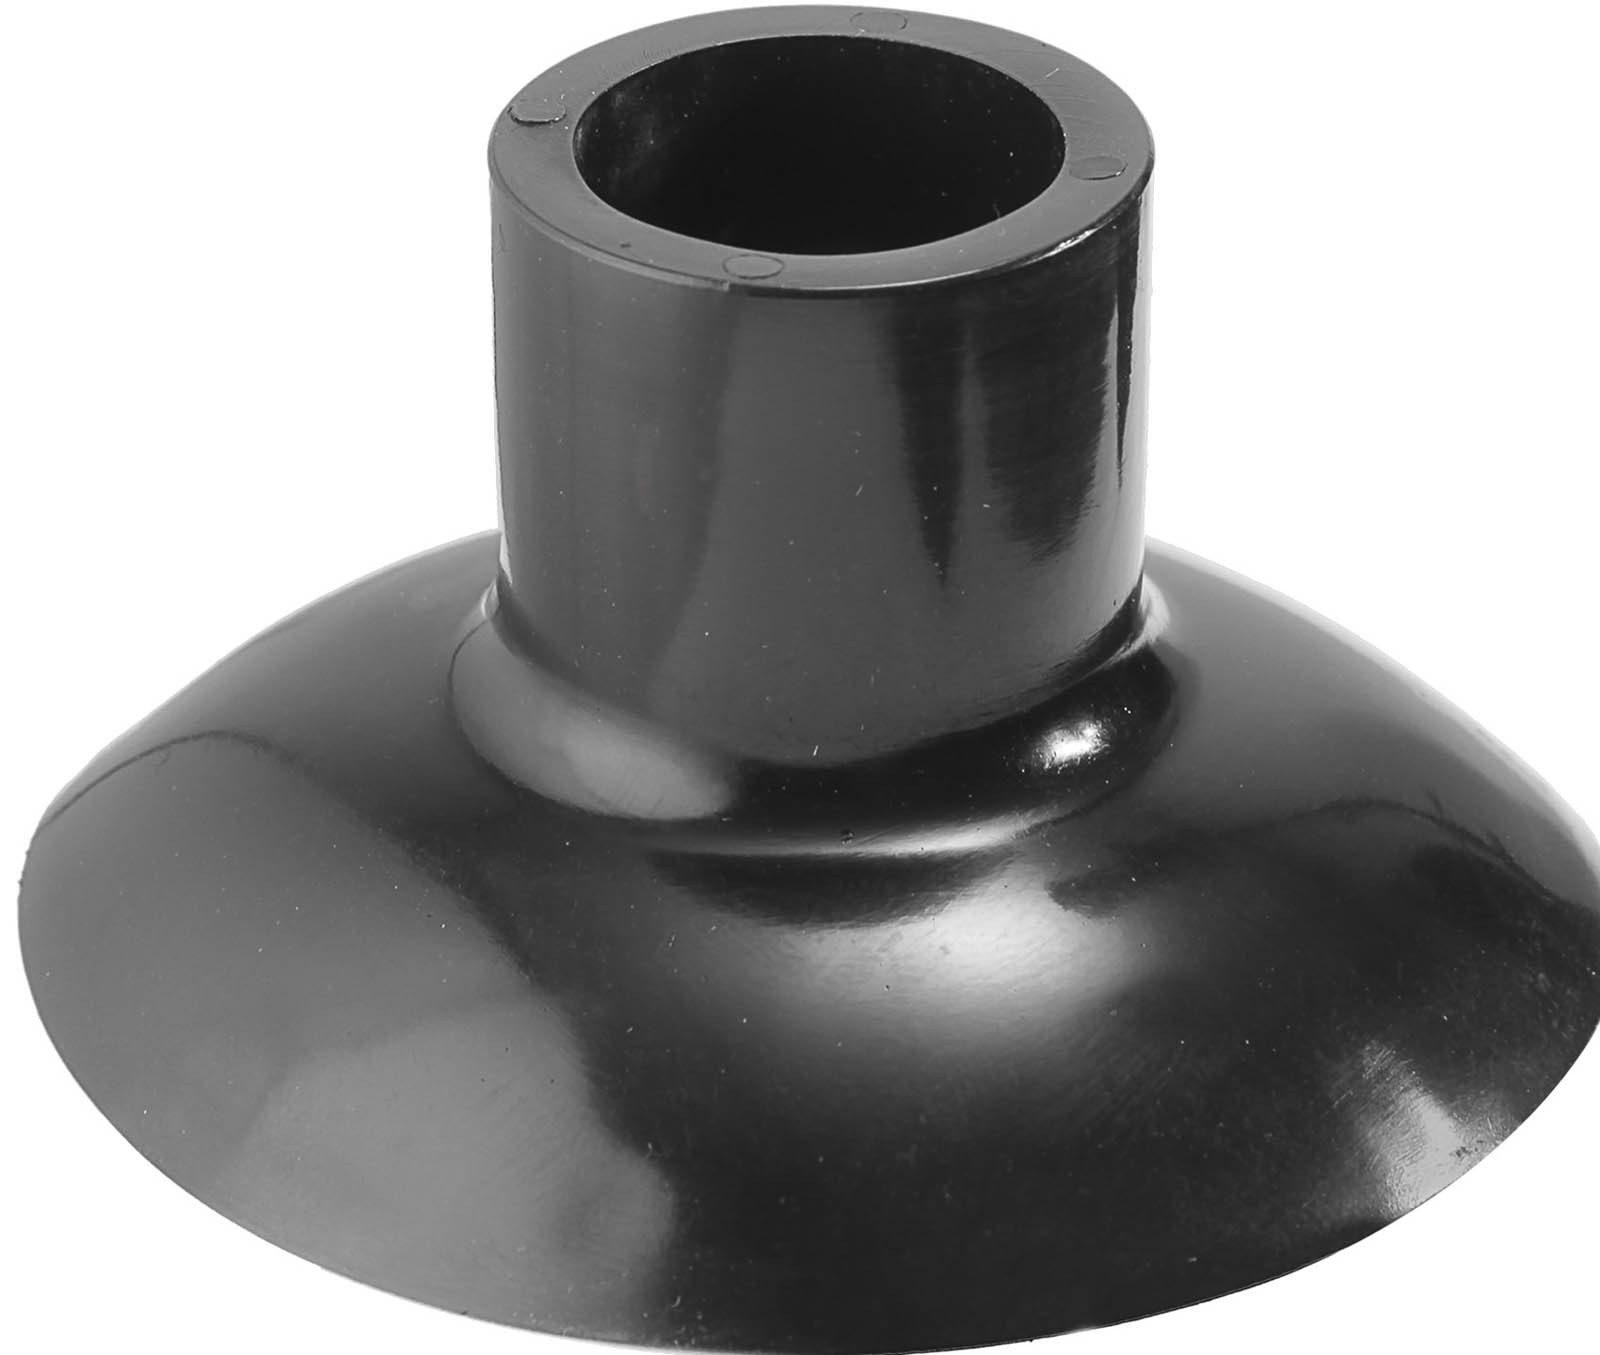 Ventosa Polecap Ì÷ 22mm